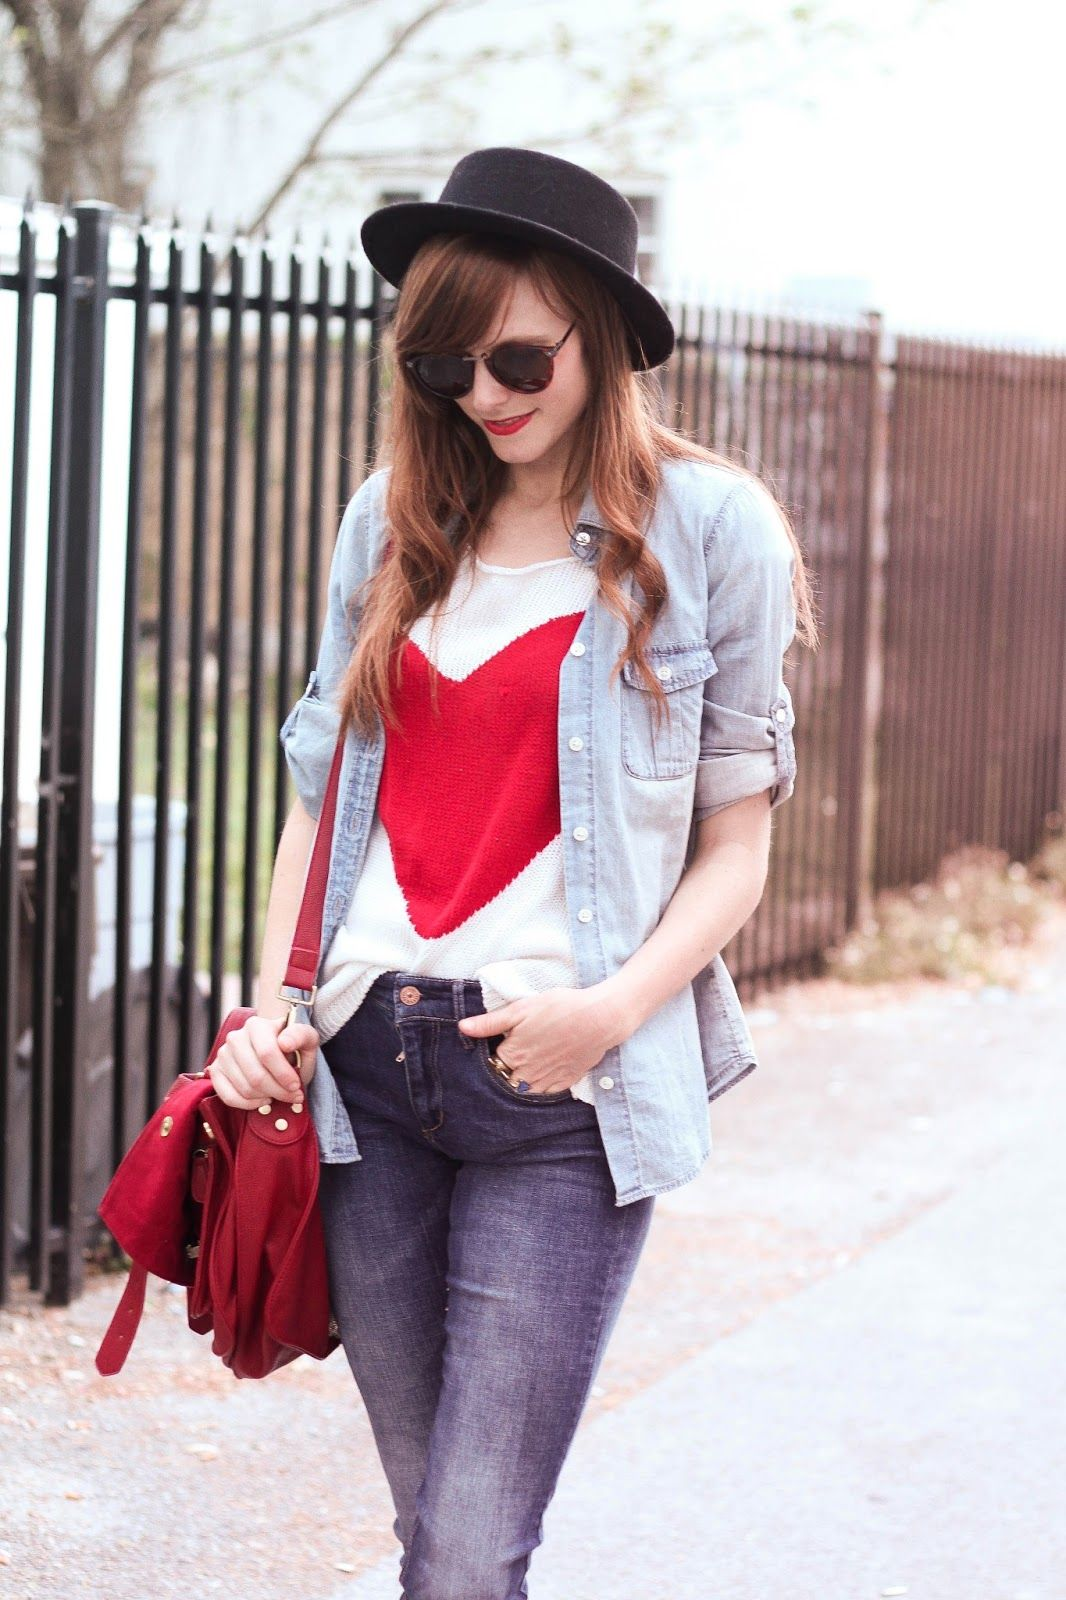 2a530548d Pin de Lina Marcela en Fashion & Beauty | Pinterest